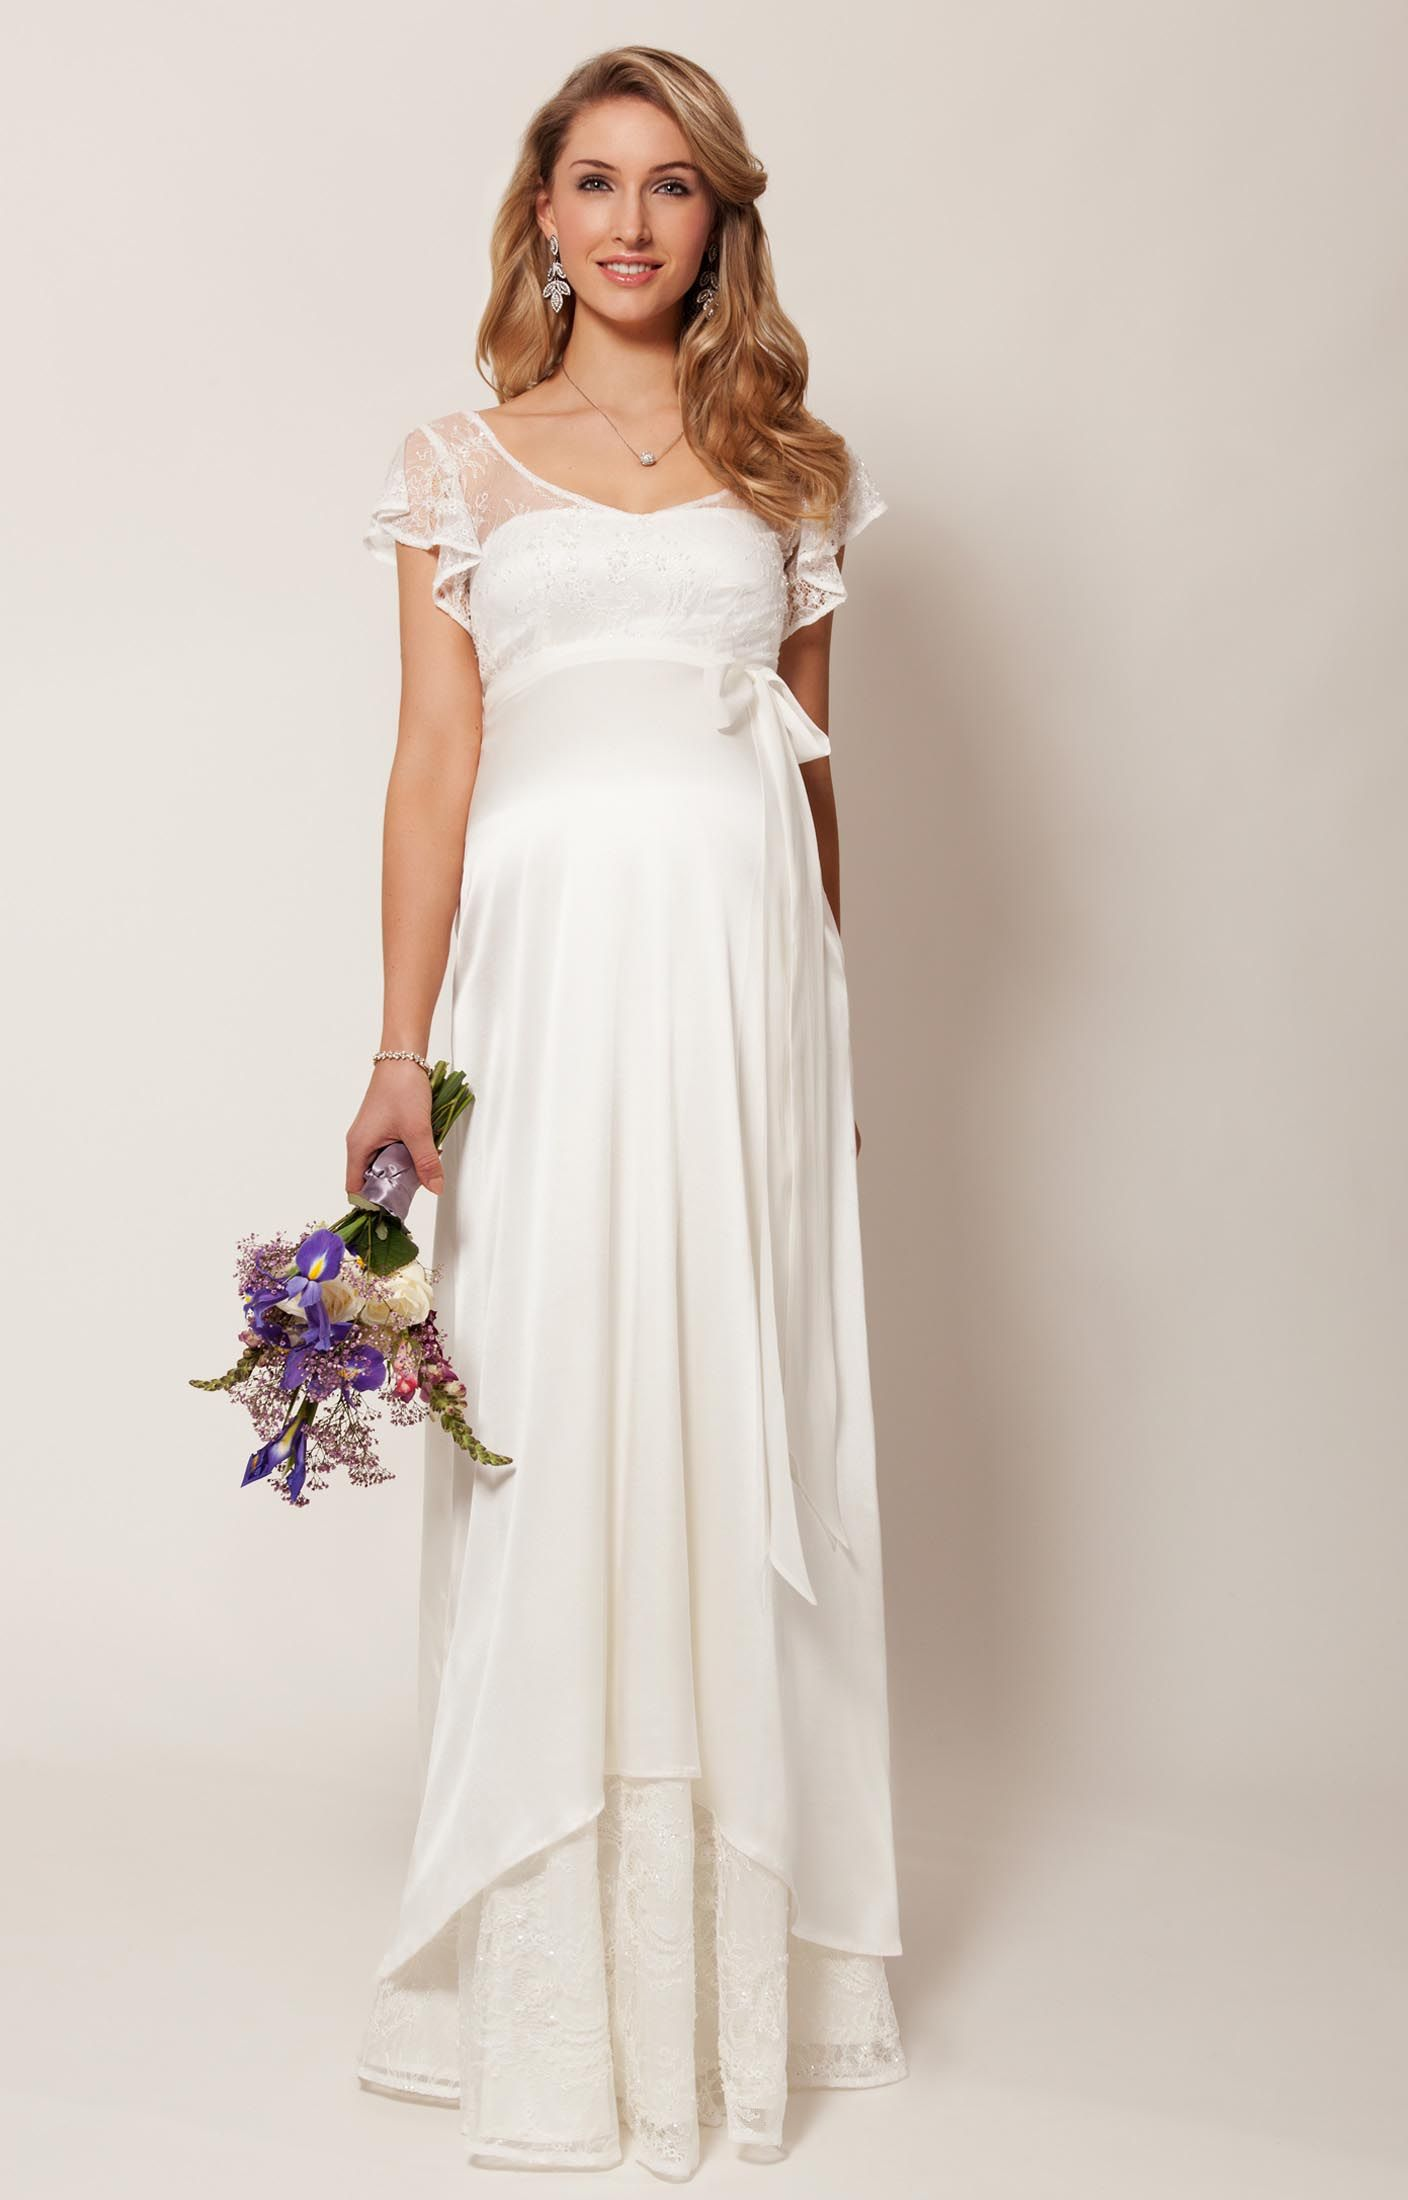 pregnant wedding dress - Google Search | Kitty\'s dress | Pinterest